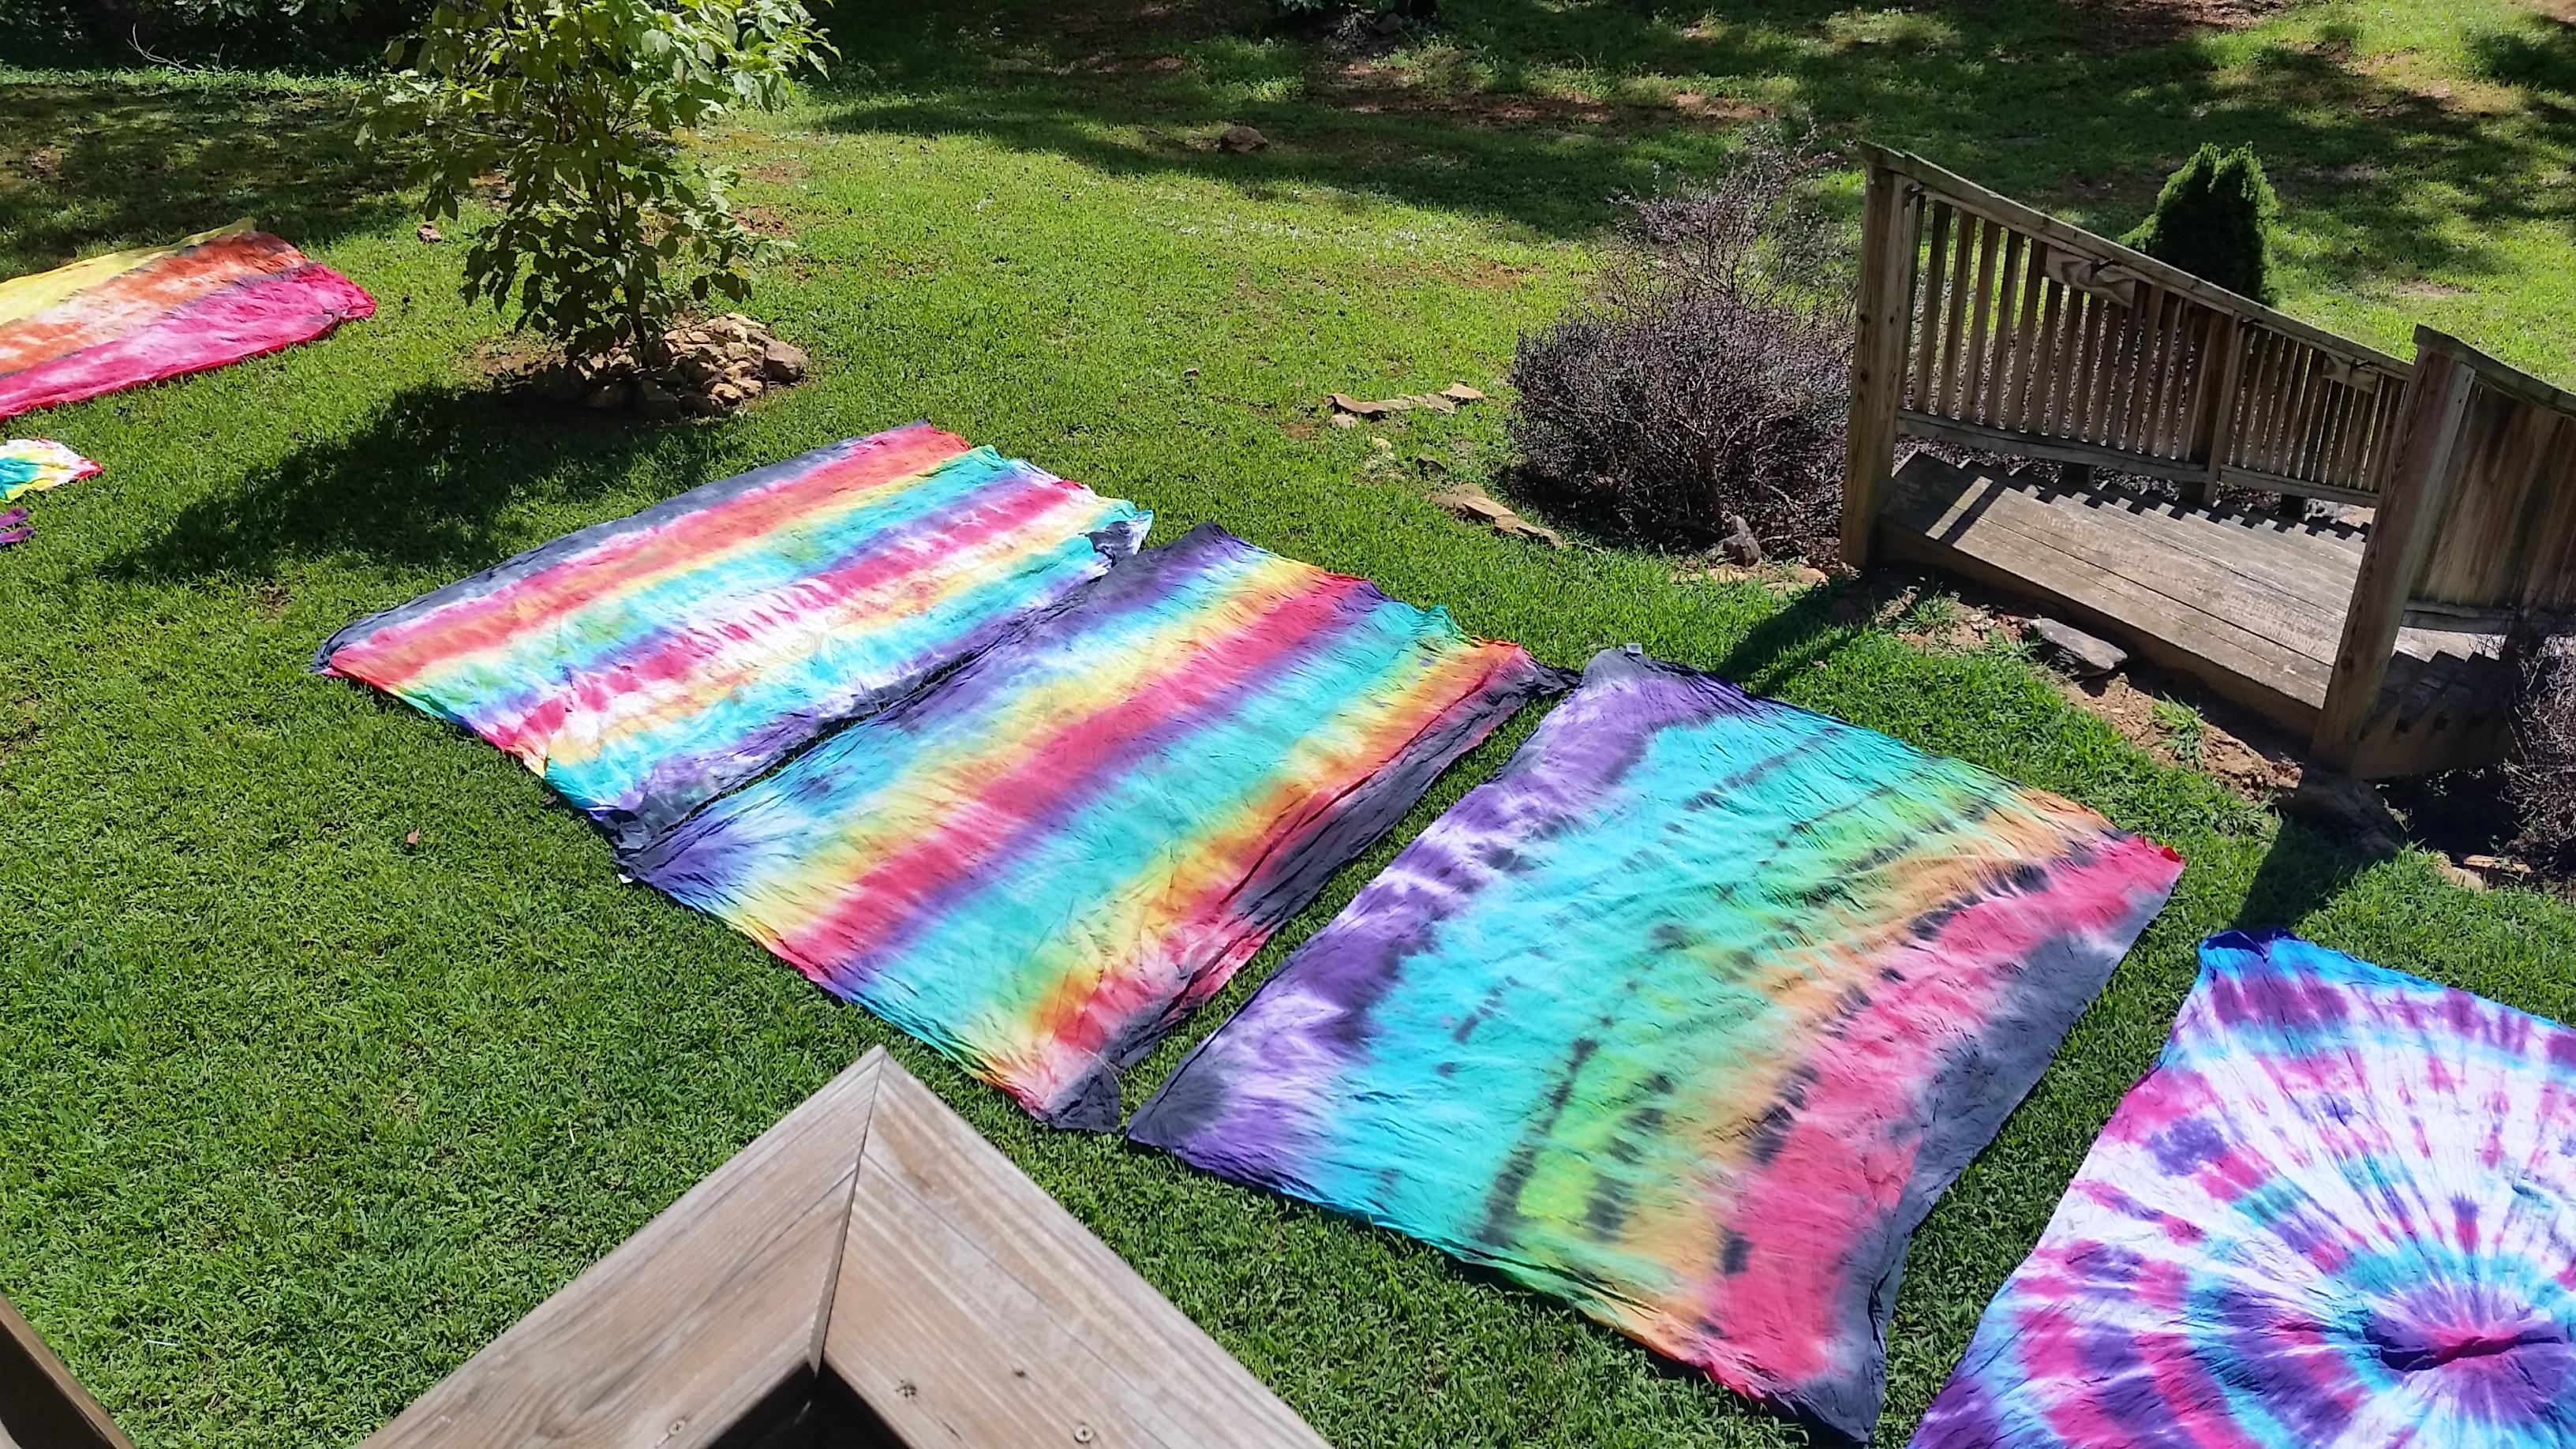 Diy Tie Dye Tapestries Girl Scout Troop Our White